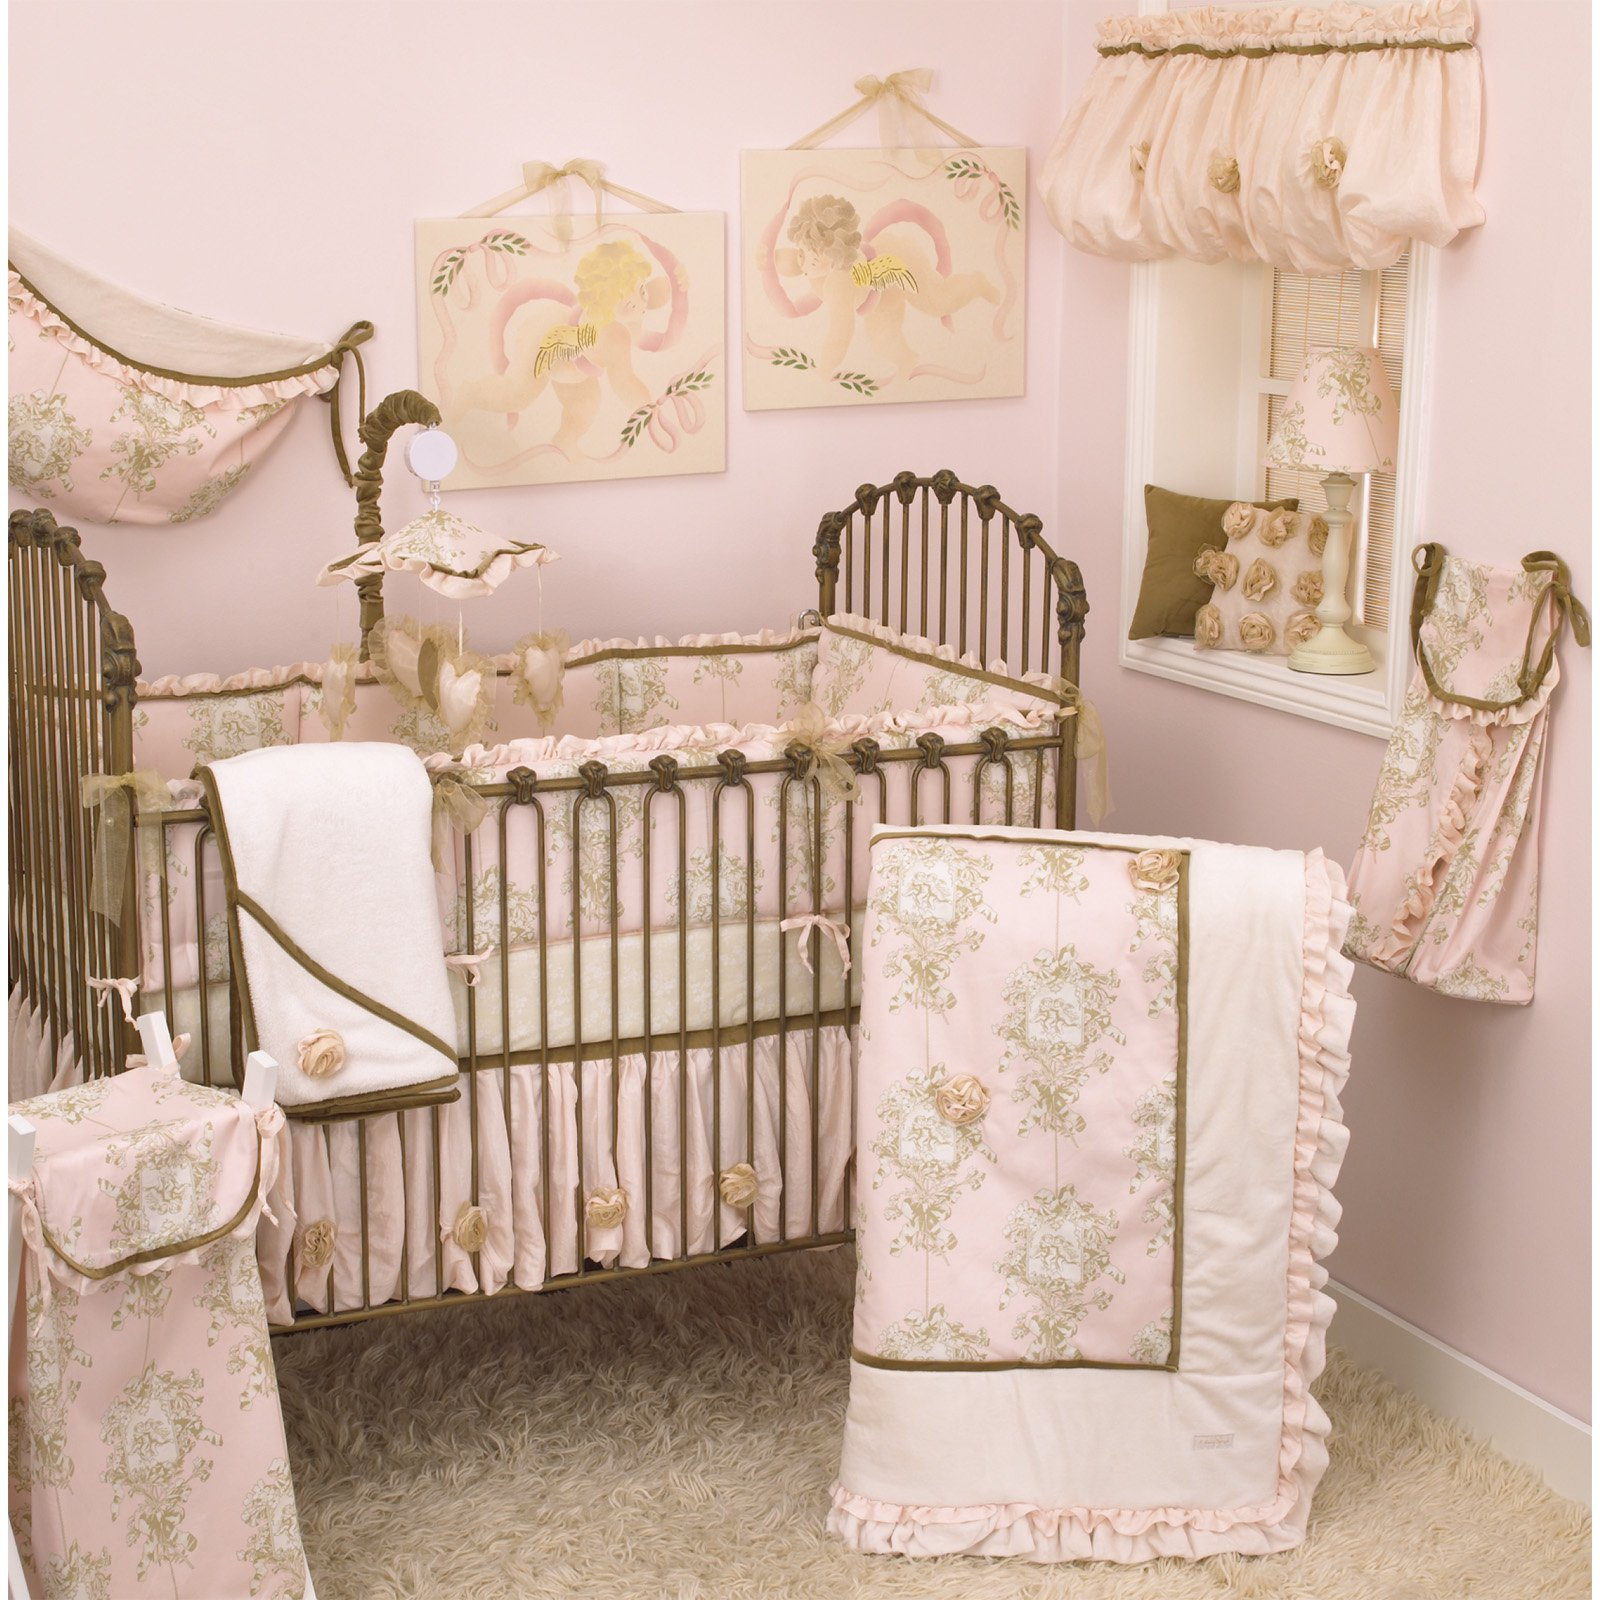 Cotton Tale Designs Lollipops And Roses 7 Piece Crib Bedding Set